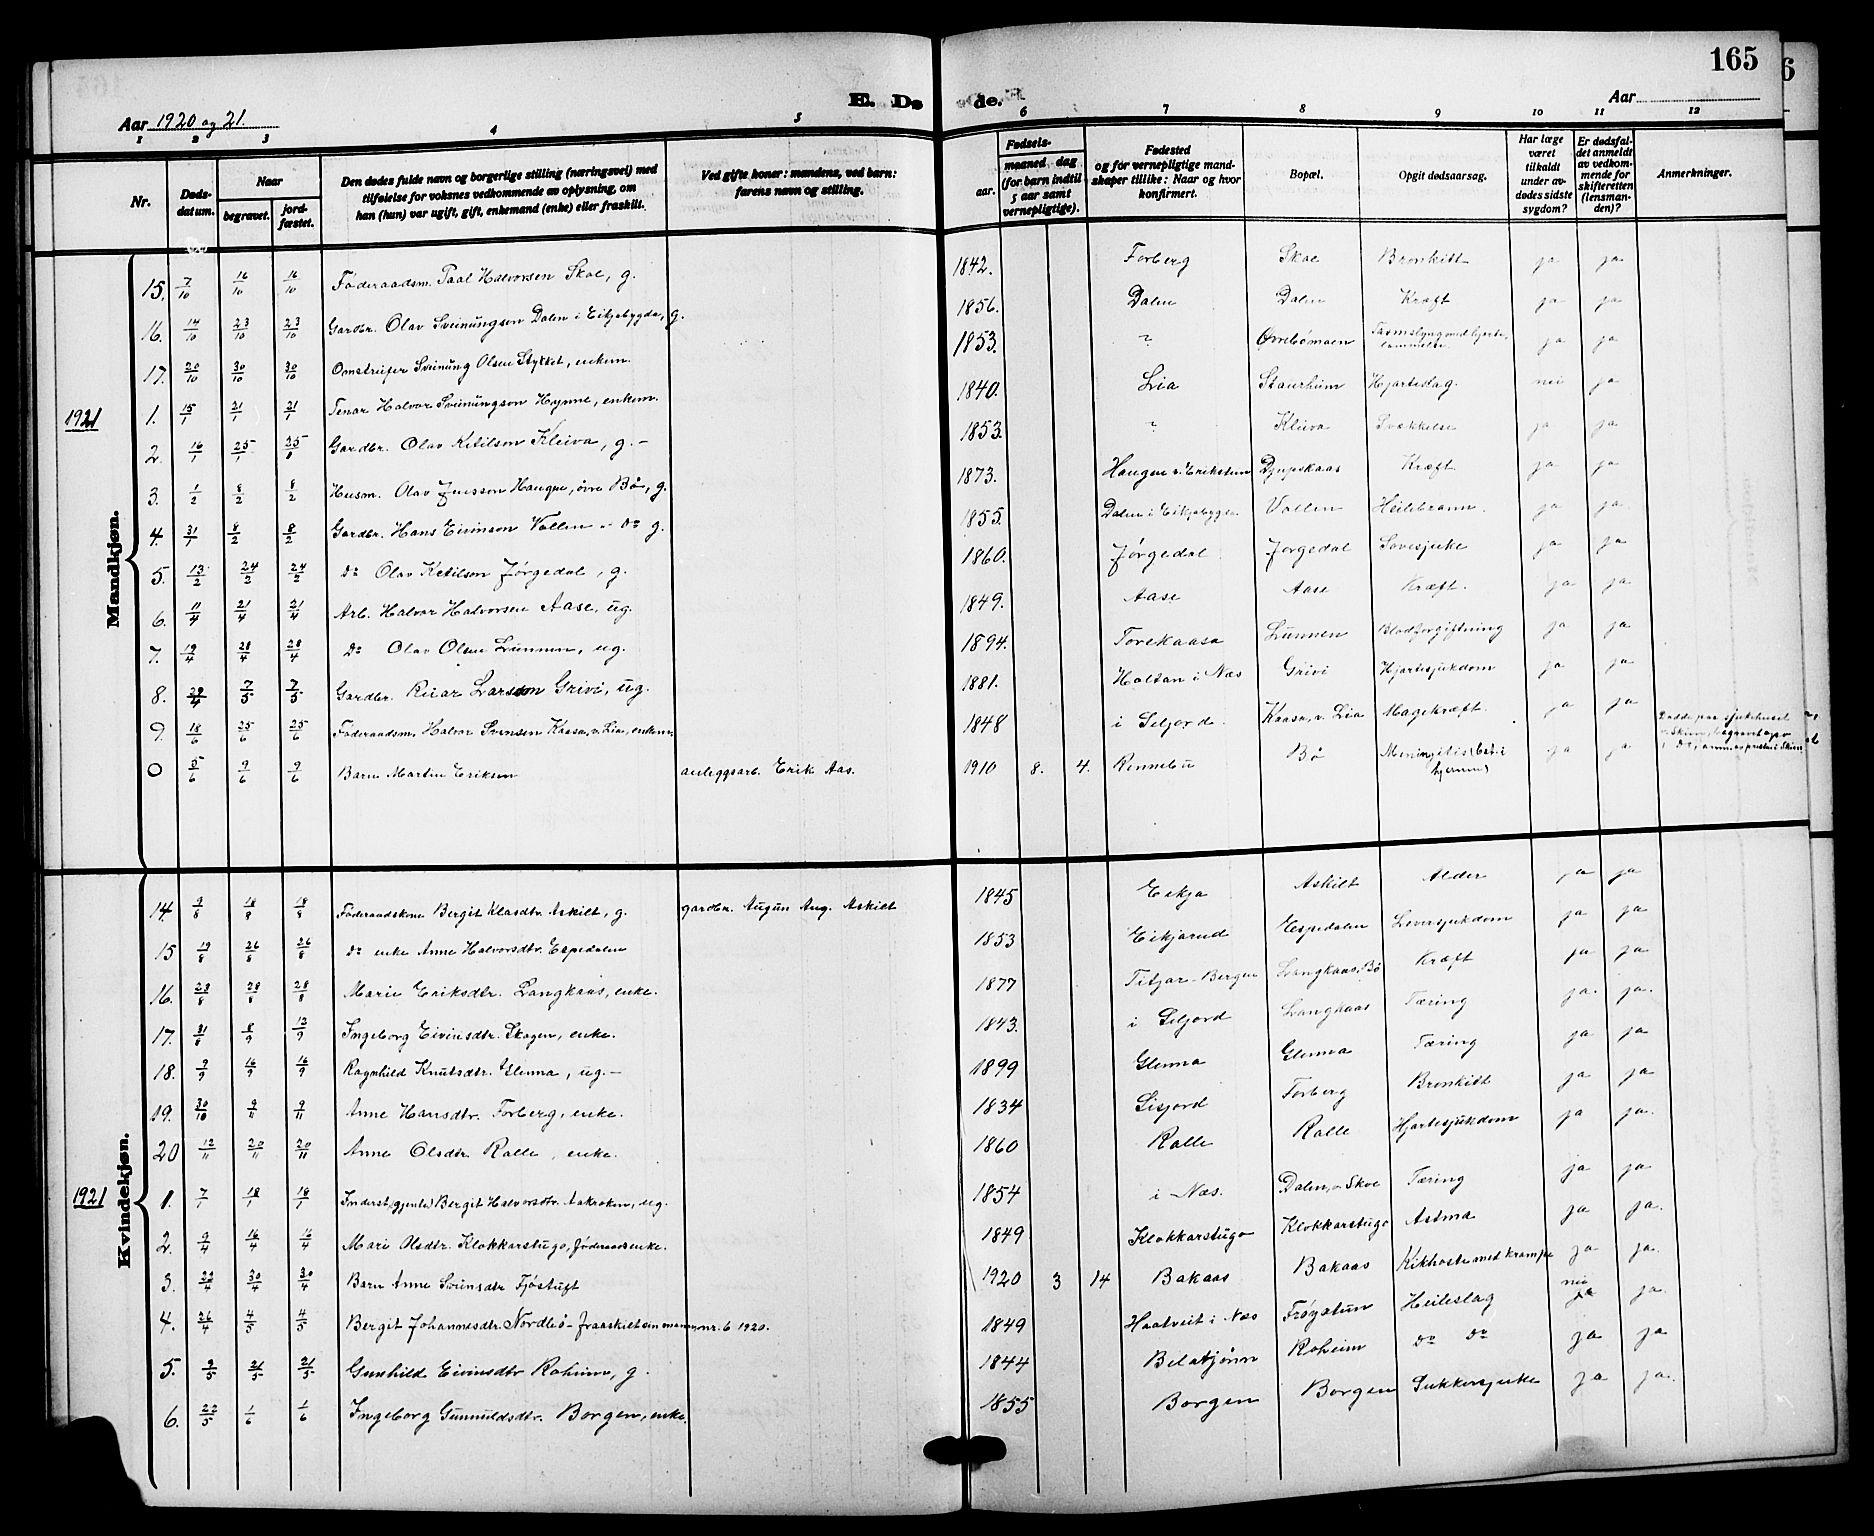 SAKO, Bø kirkebøker, G/Ga/L0007: Klokkerbok nr. 7, 1909-1924, s. 165